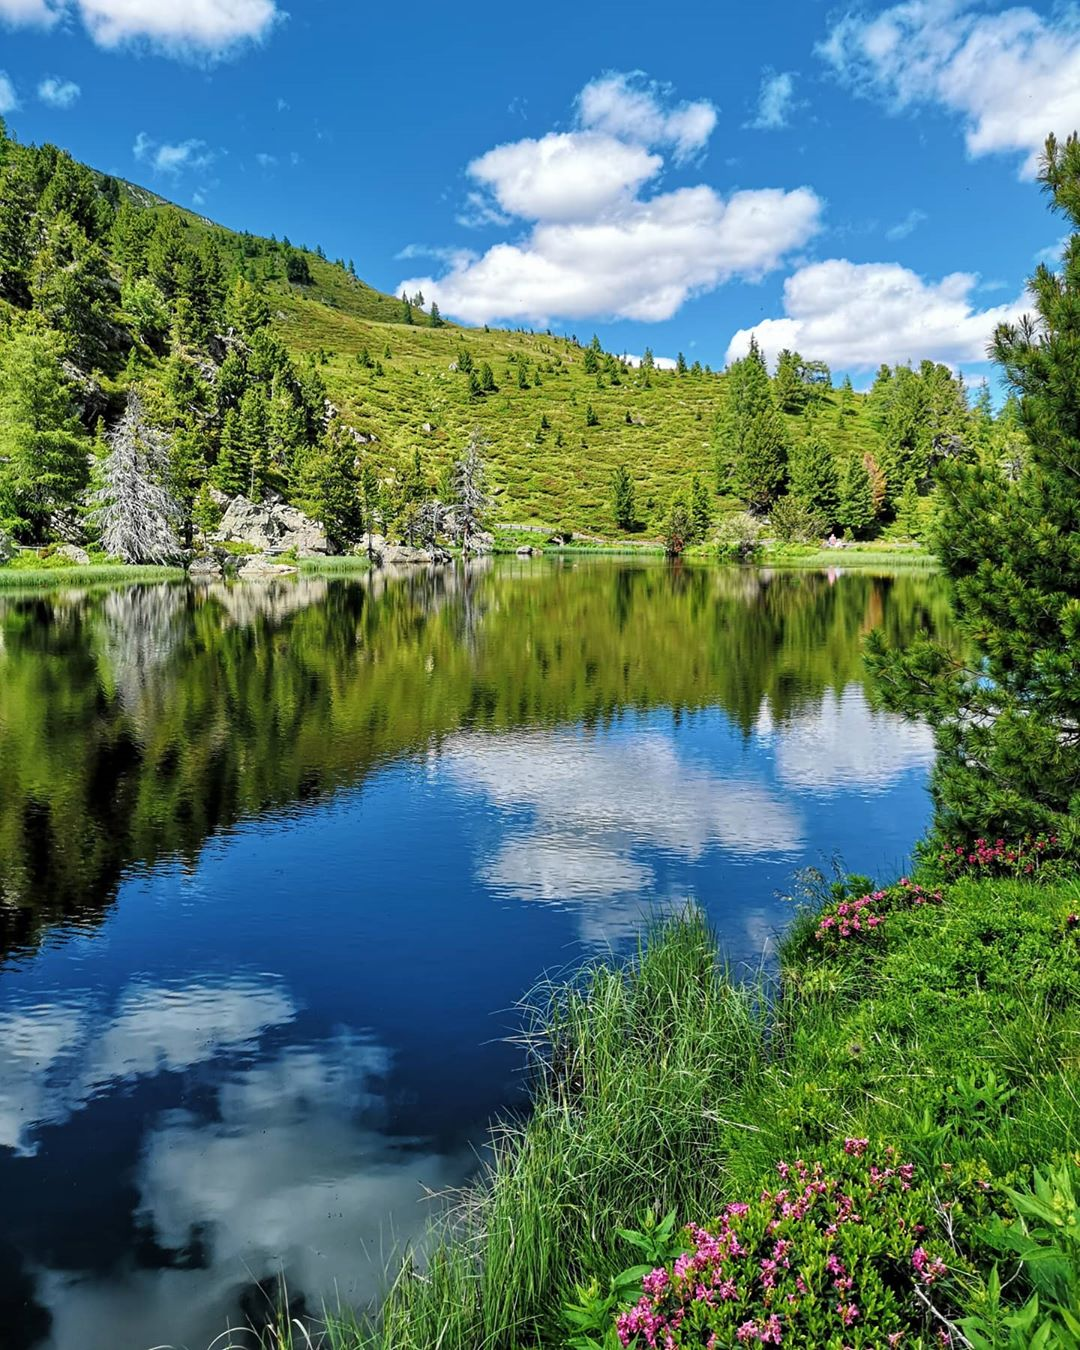 Around the Windeben lake along the Nockalm Road